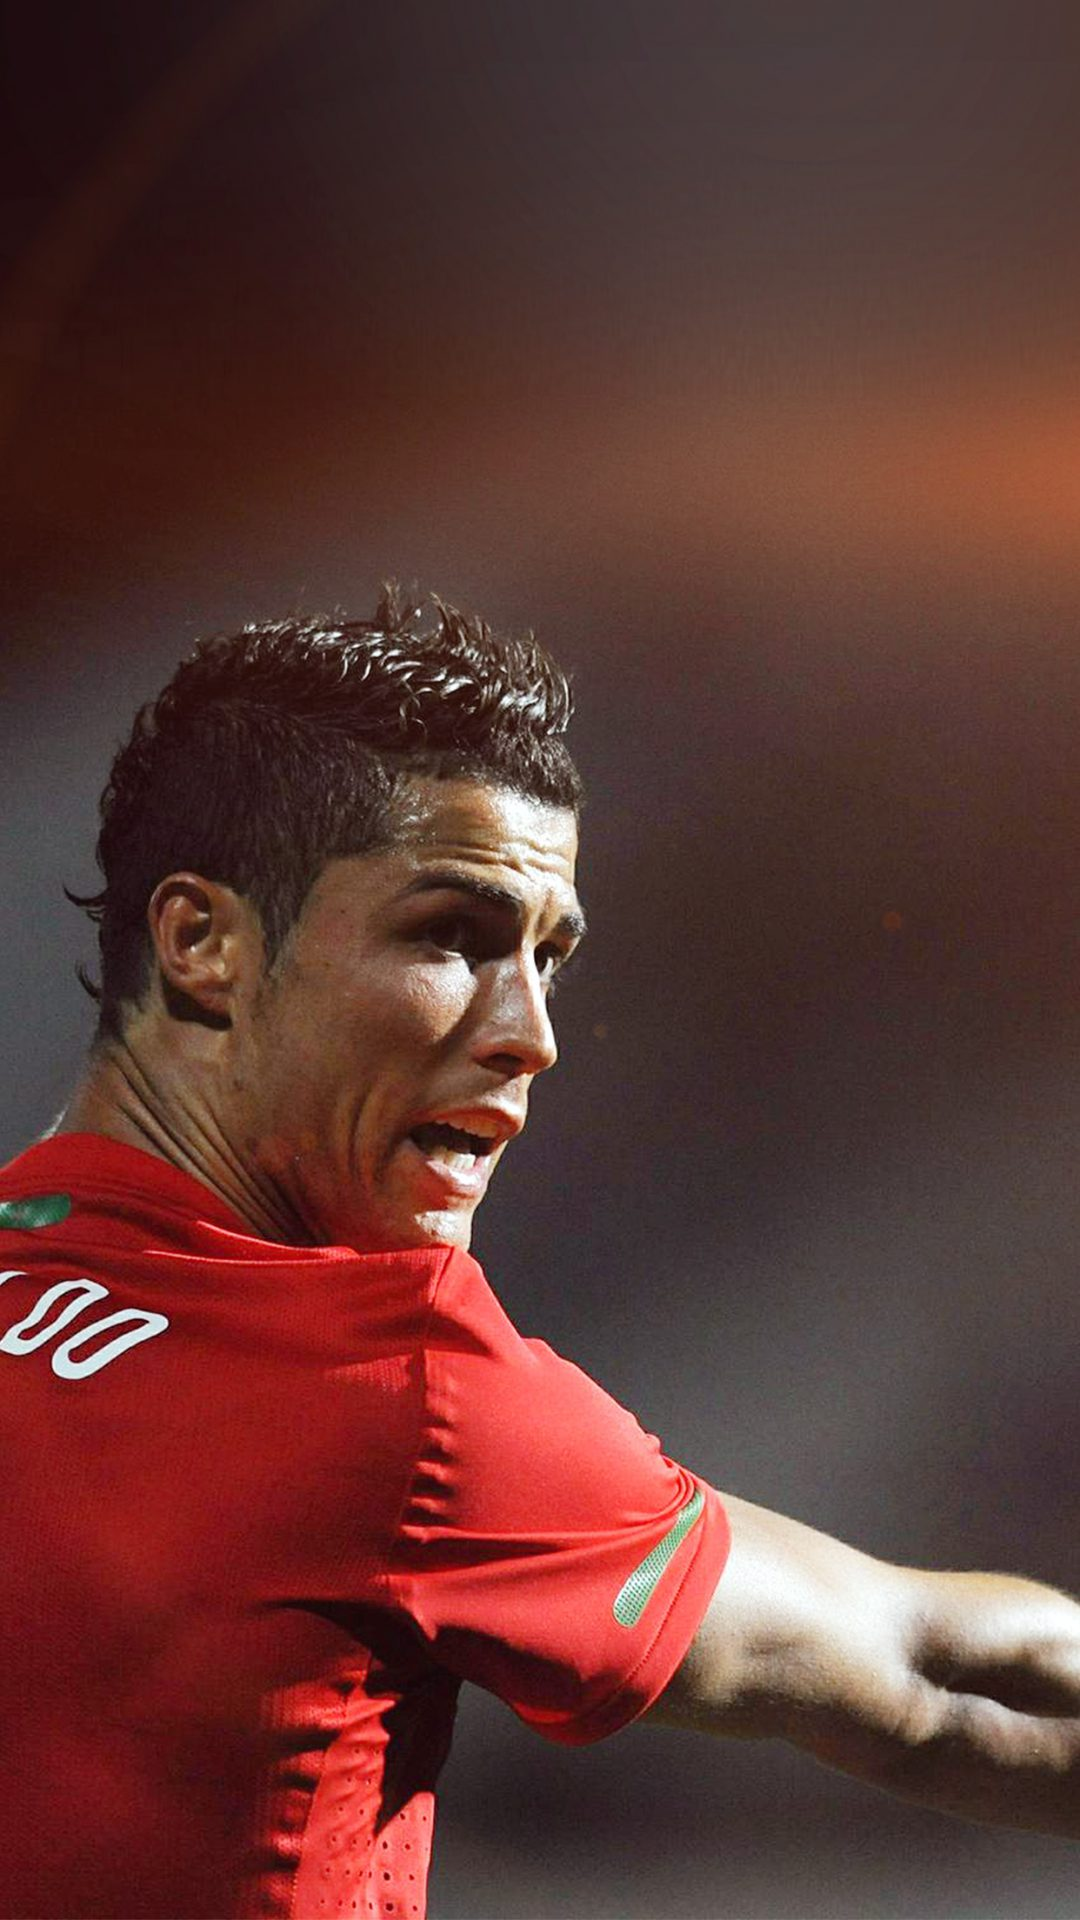 Ronaldo Soccer Sports Star 7 Fan Captain